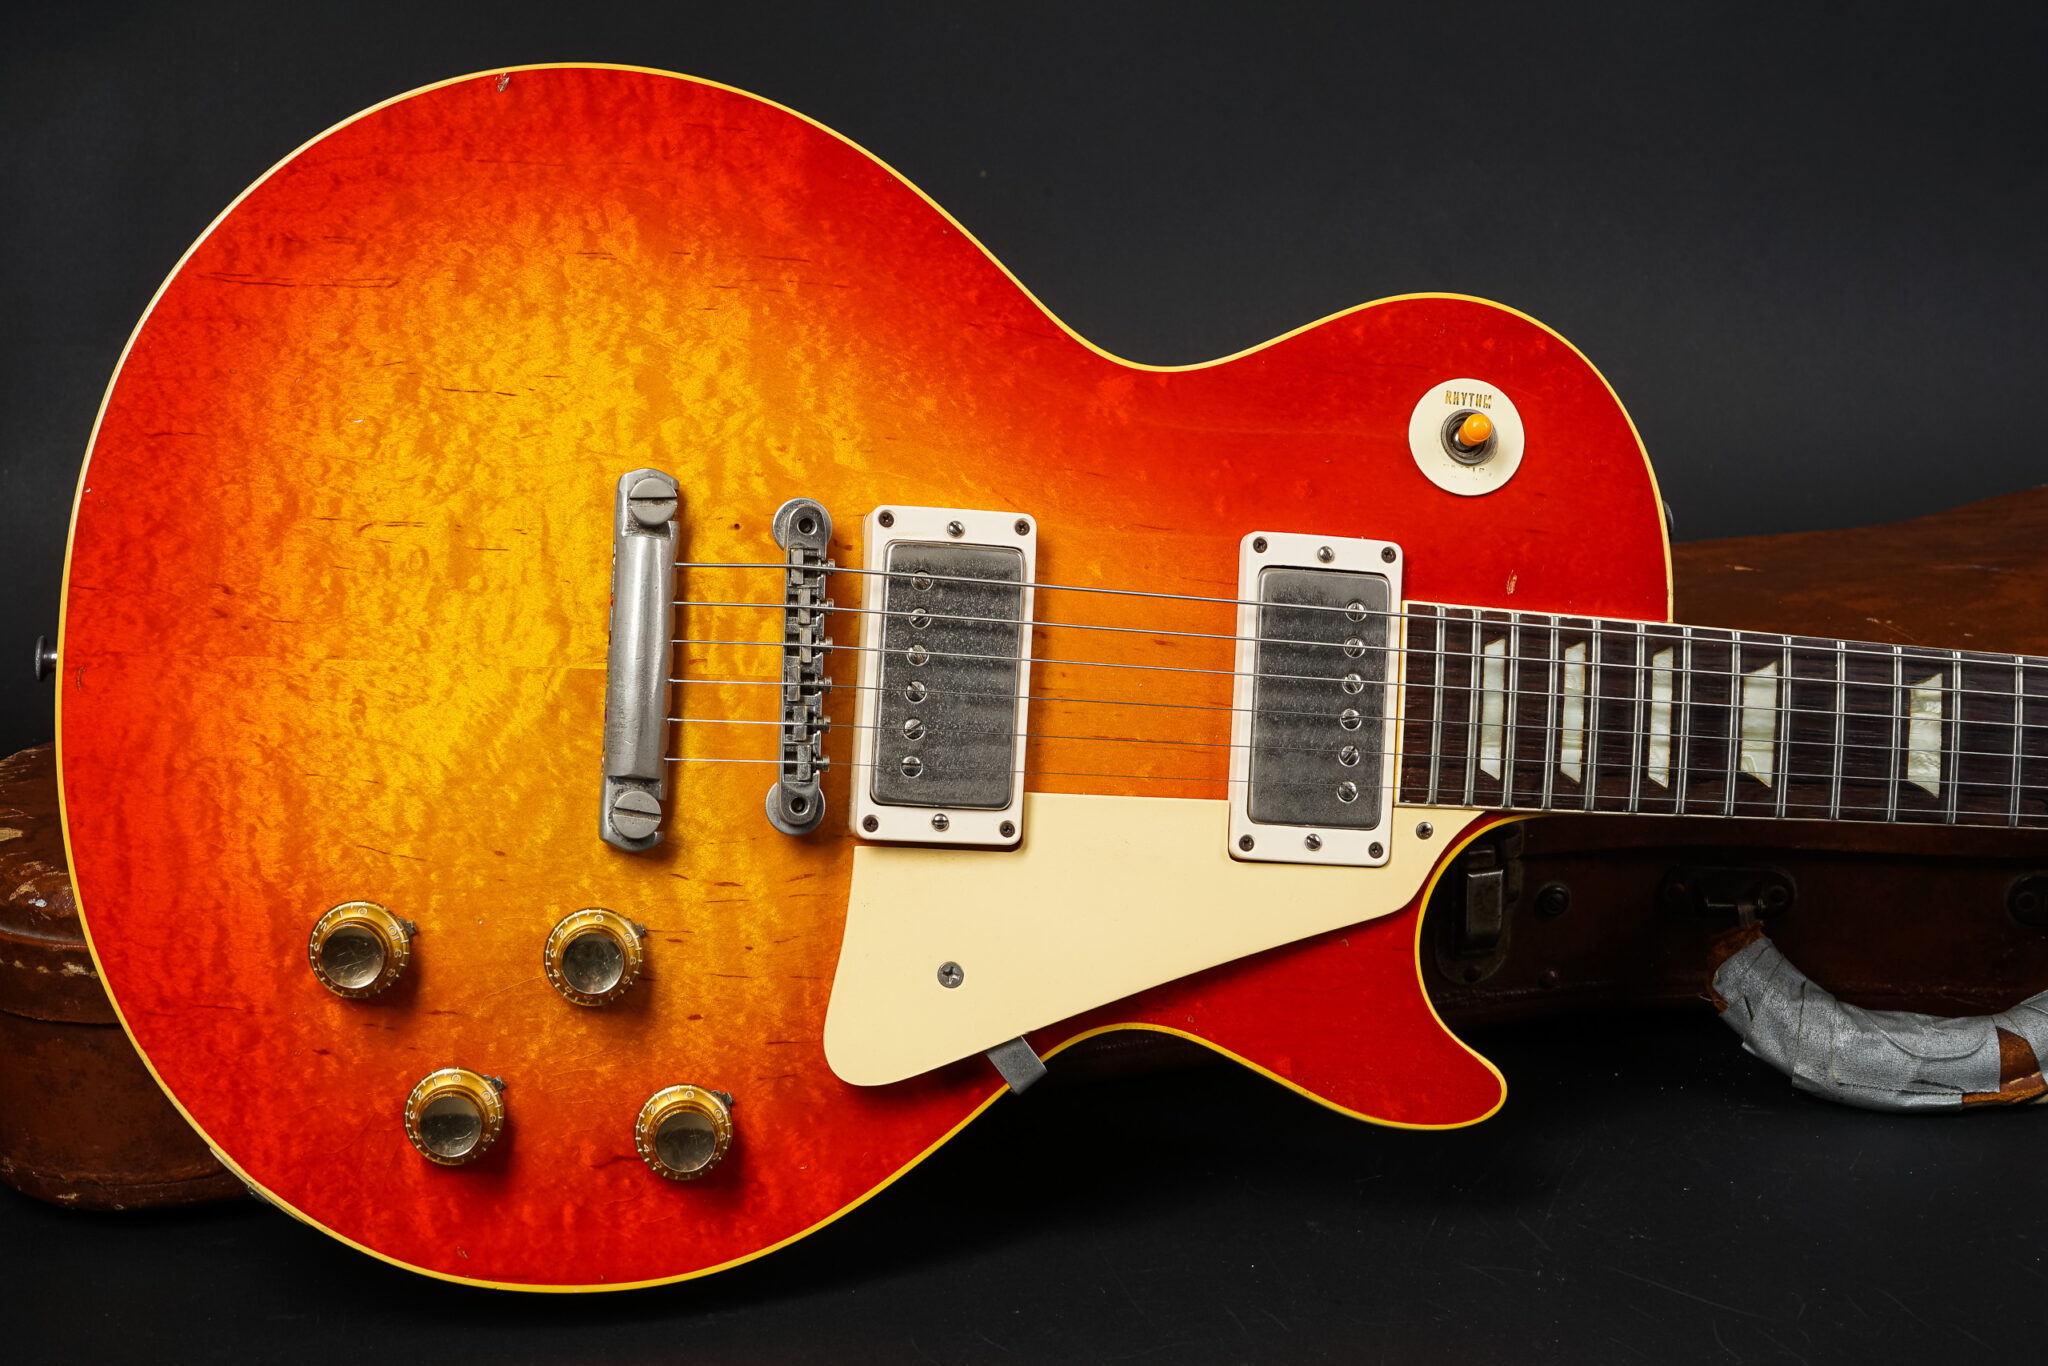 https://guitarpoint.de/app/uploads/products/1960-gibson-les-paul-standard-sunburst-3/1960-Gibson-Les-Paul-Standard-Sunburst-010838-9-2048x1366.jpg